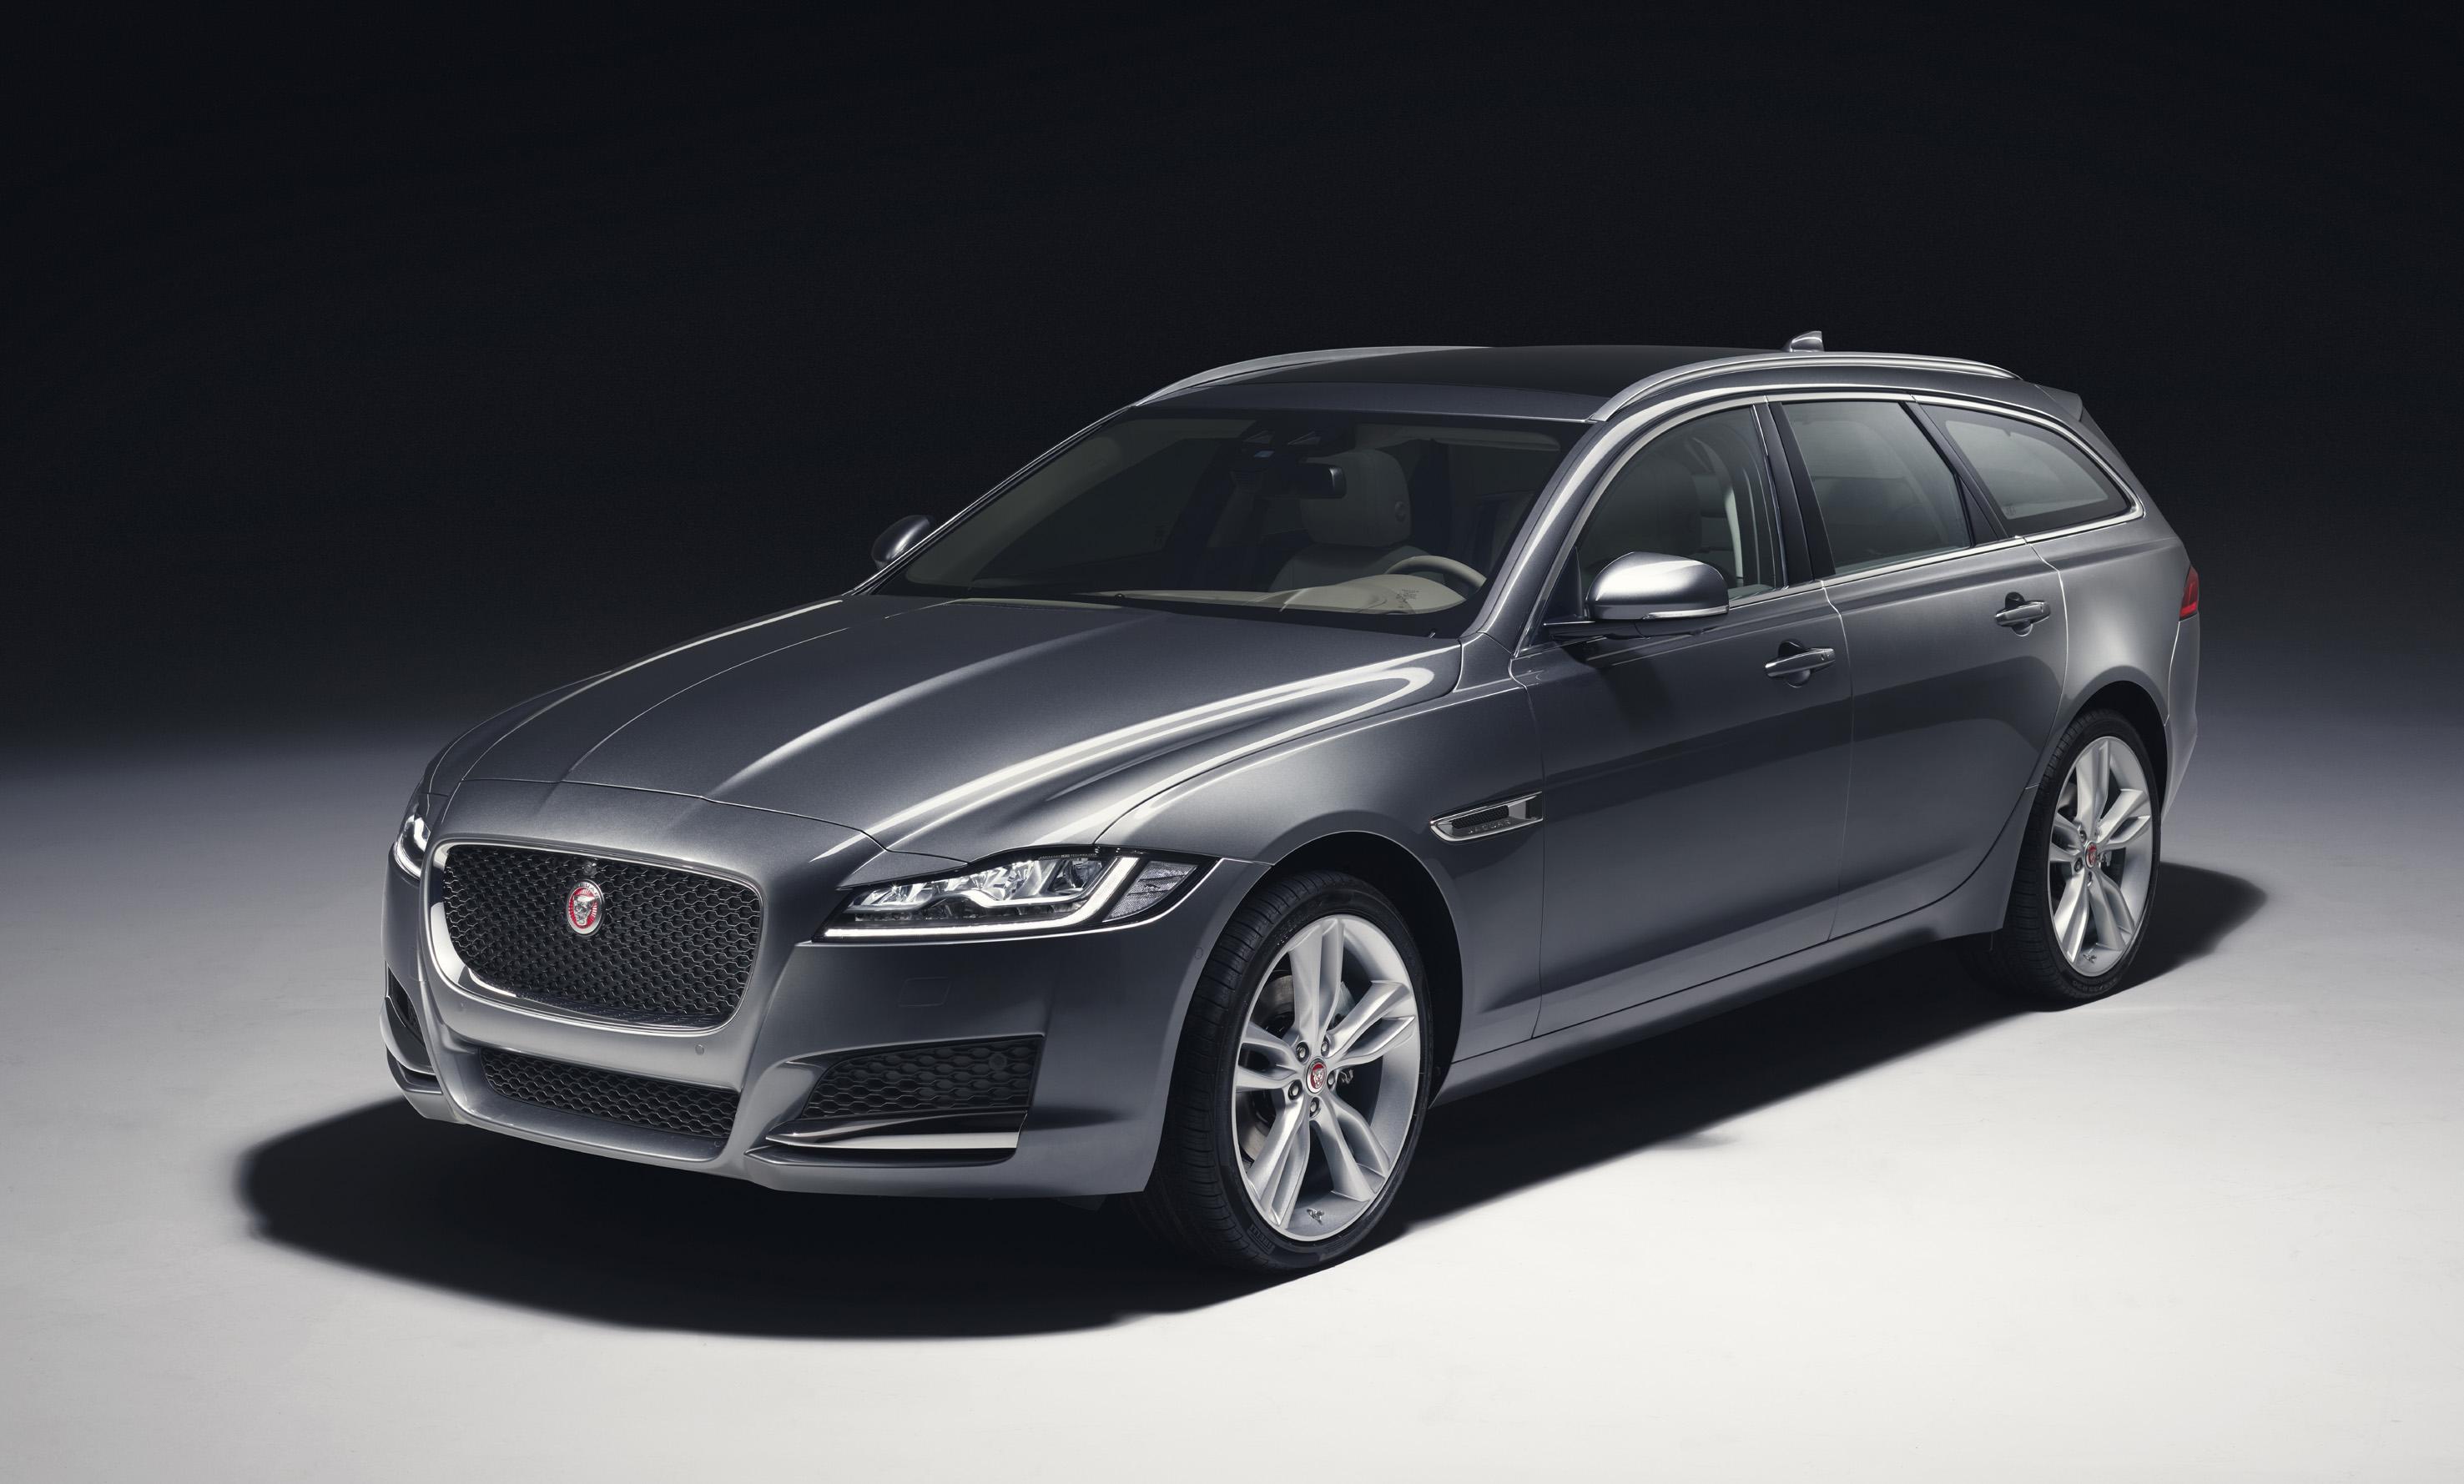 Jaguar XF Sportbrake 2017 caratteristiche scheda tecnica